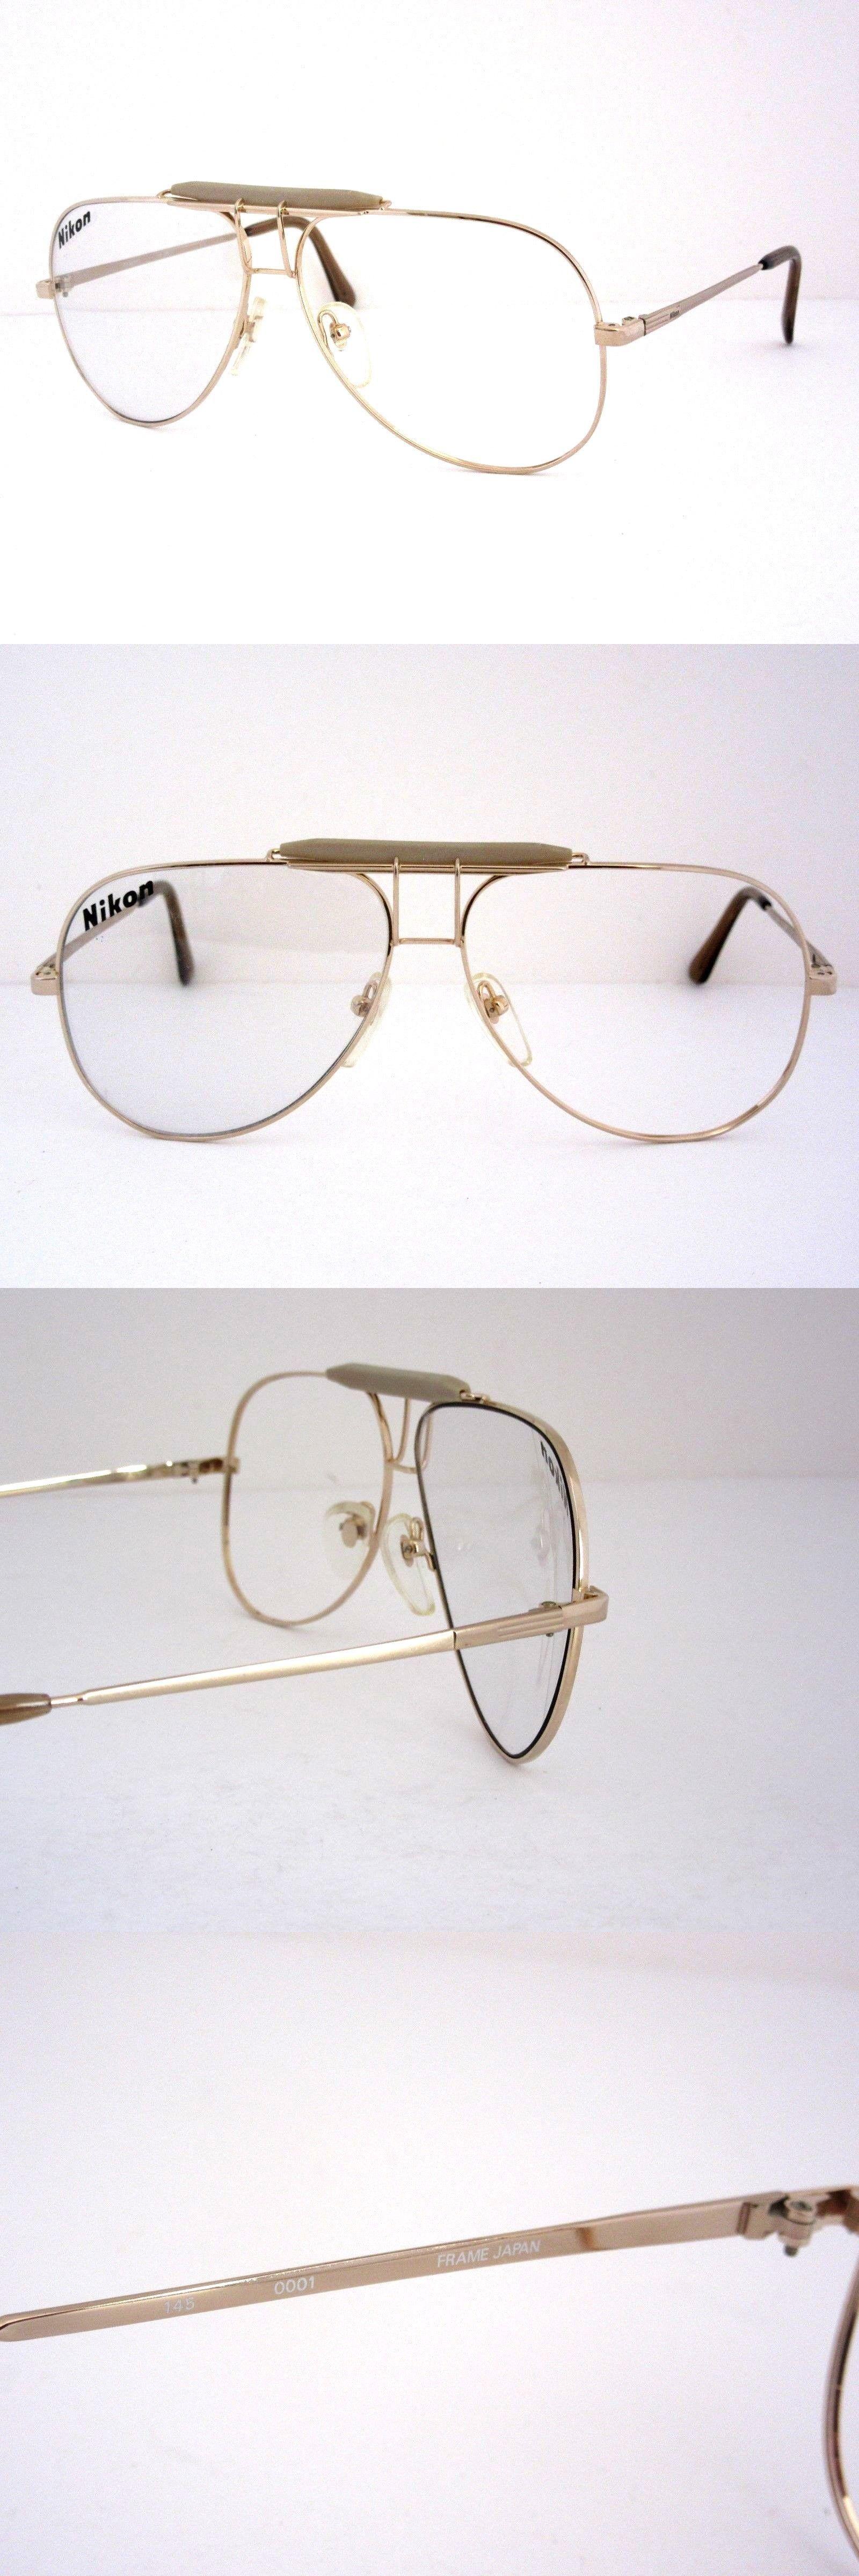 e43caecc872d Eyeglasses 175805  Nikon Nk 5403 Men S Large Aviator Eyeglass Frames ...